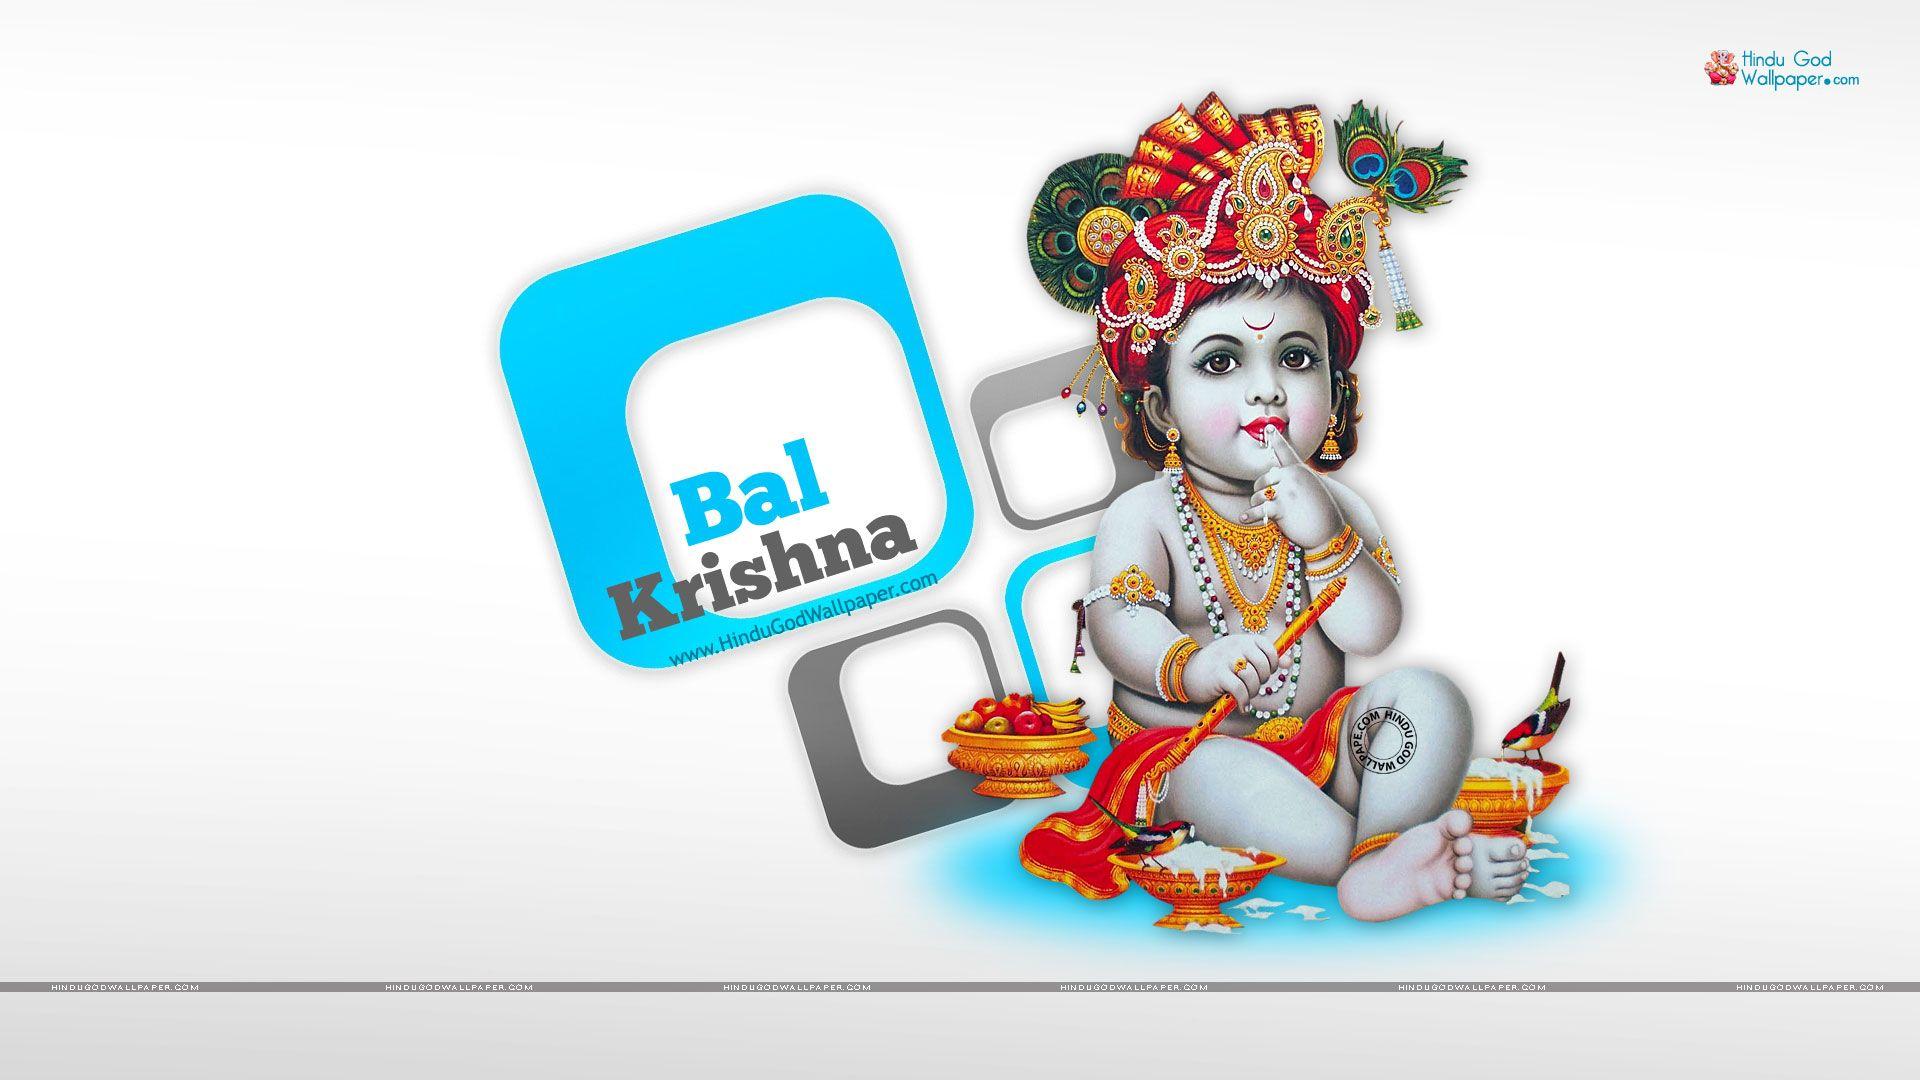 bal krishna hd wallpapers 1080p high resolution download hd wallpapers 1080p bal krishna hd wallpaper bal krishna hd wallpapers 1080p high